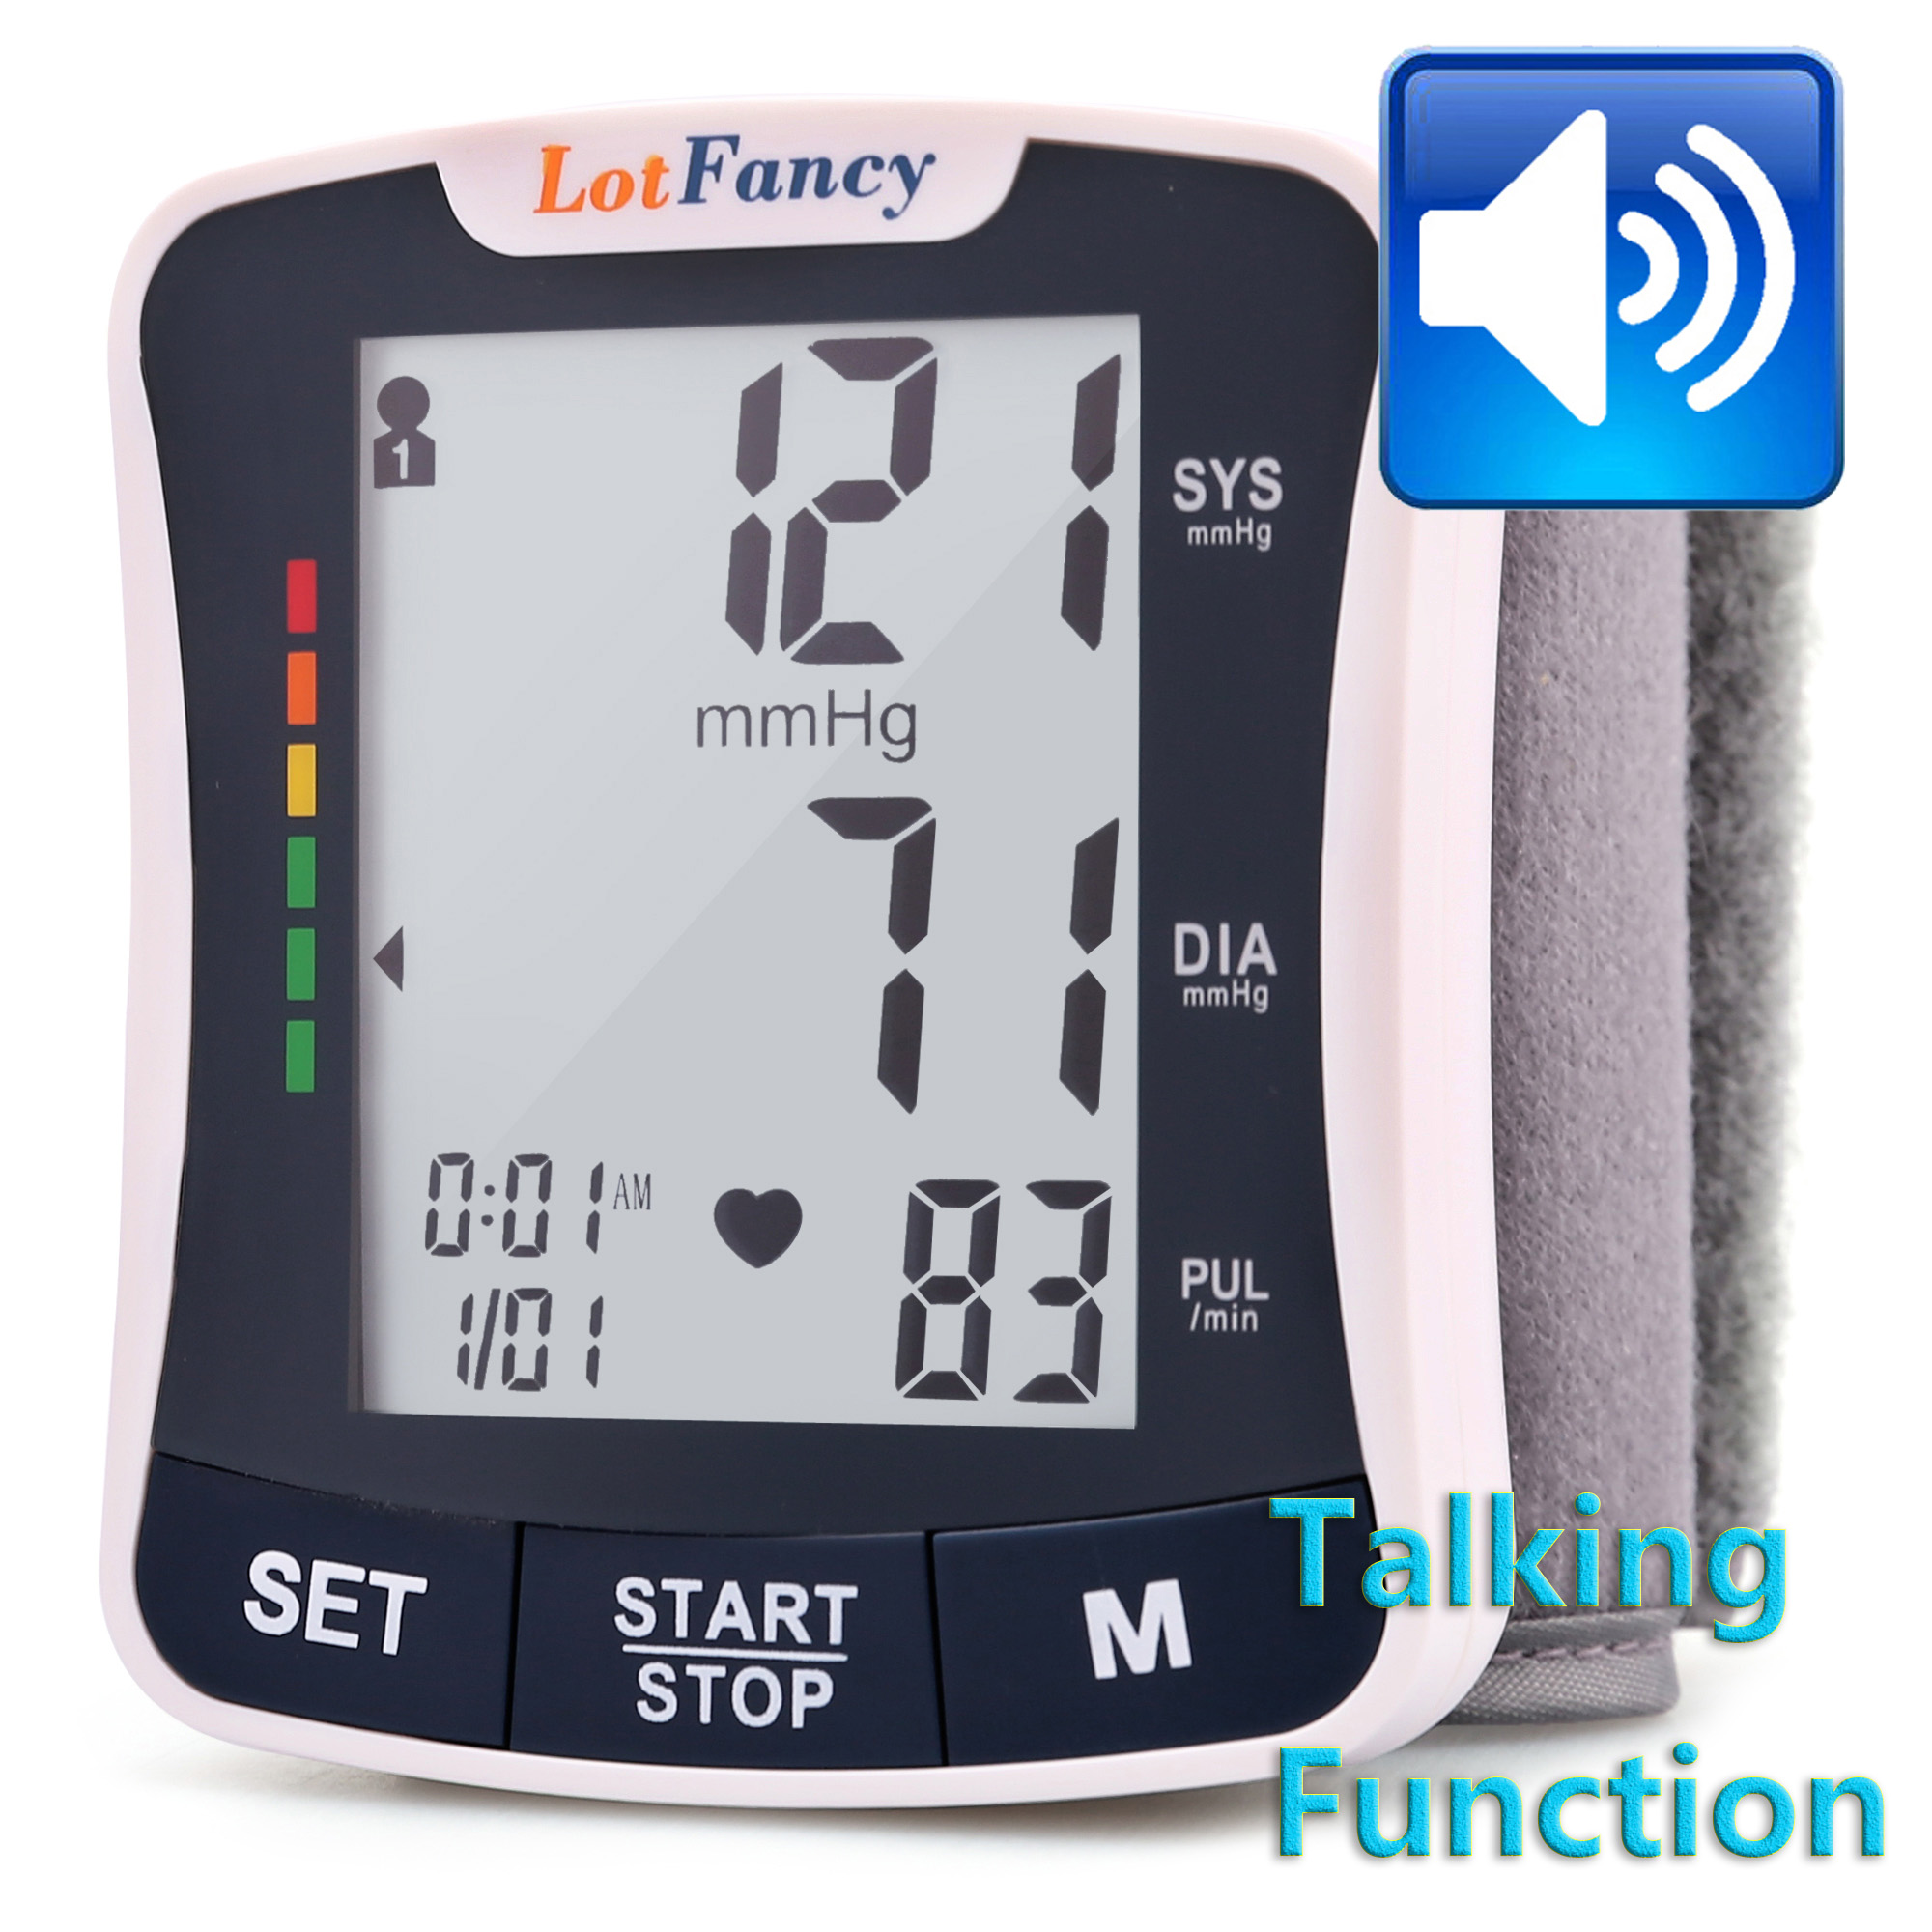 Wrist Blood Pressure Monitor Cuff - Automatic Digital BP Machine with Talking Function